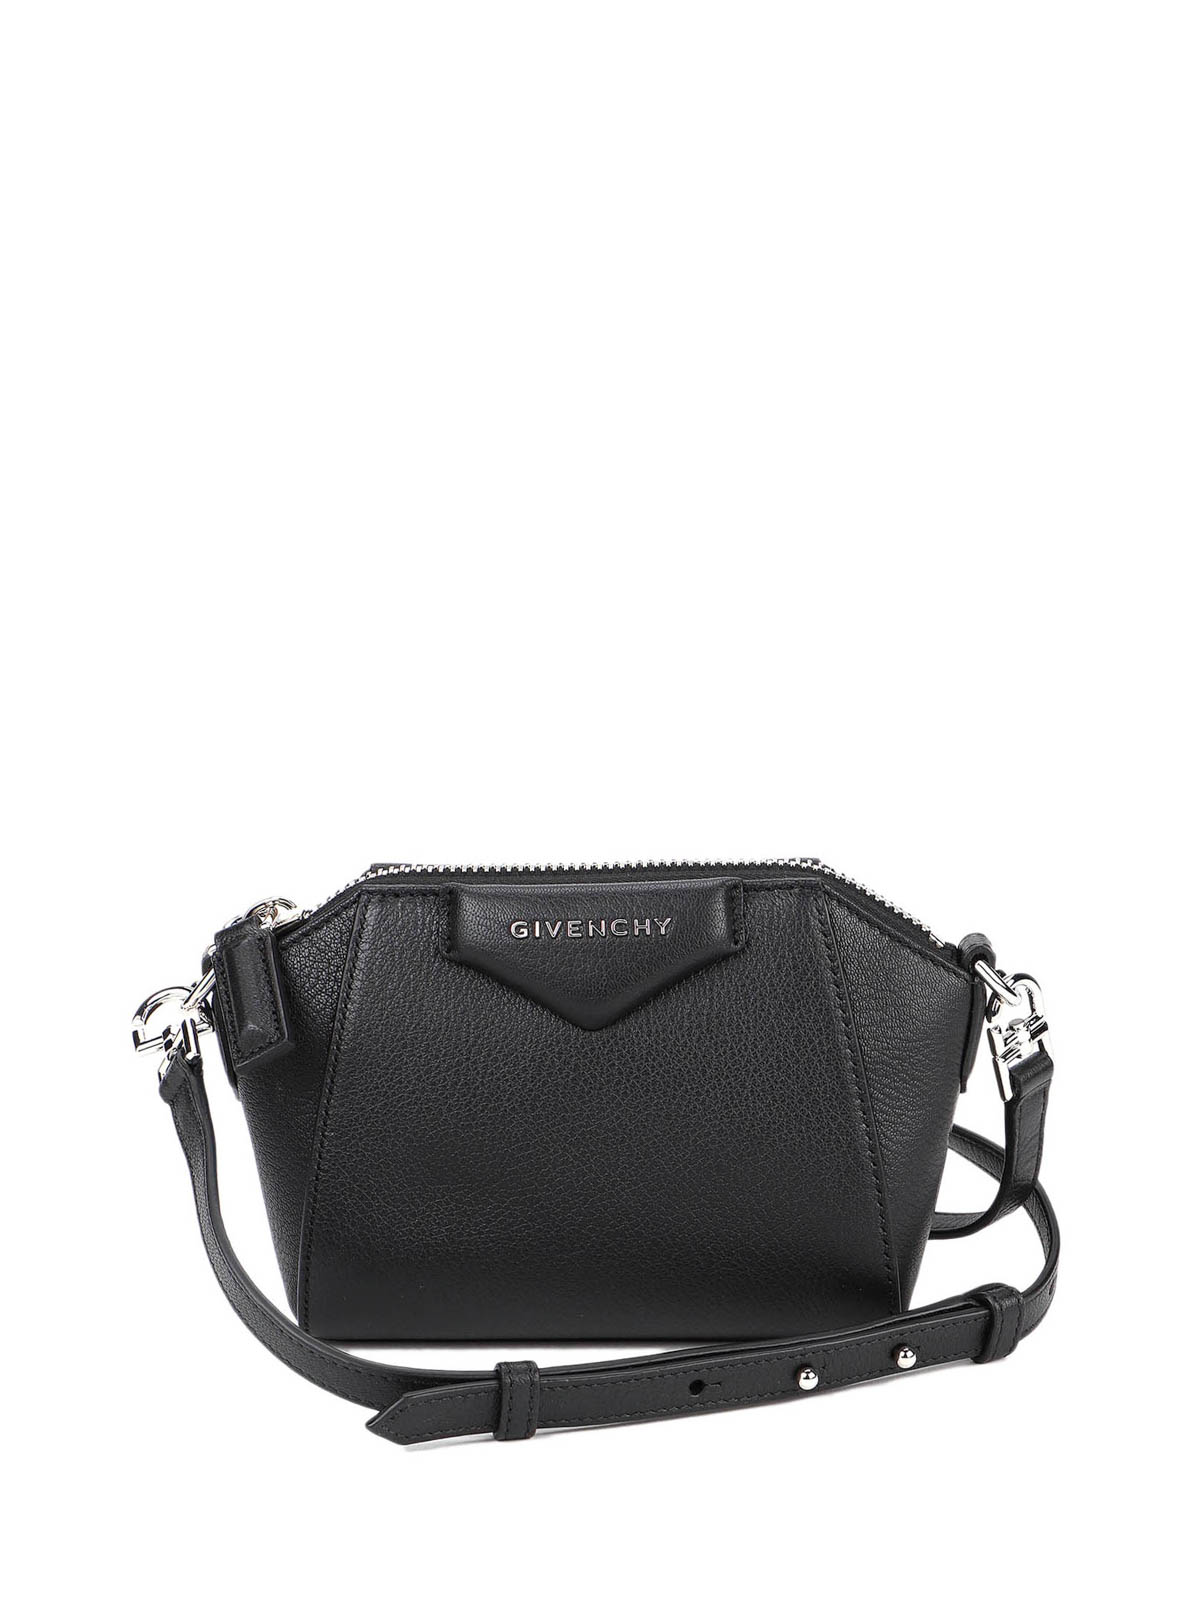 Givenchy ANTIGONA NANO BAG